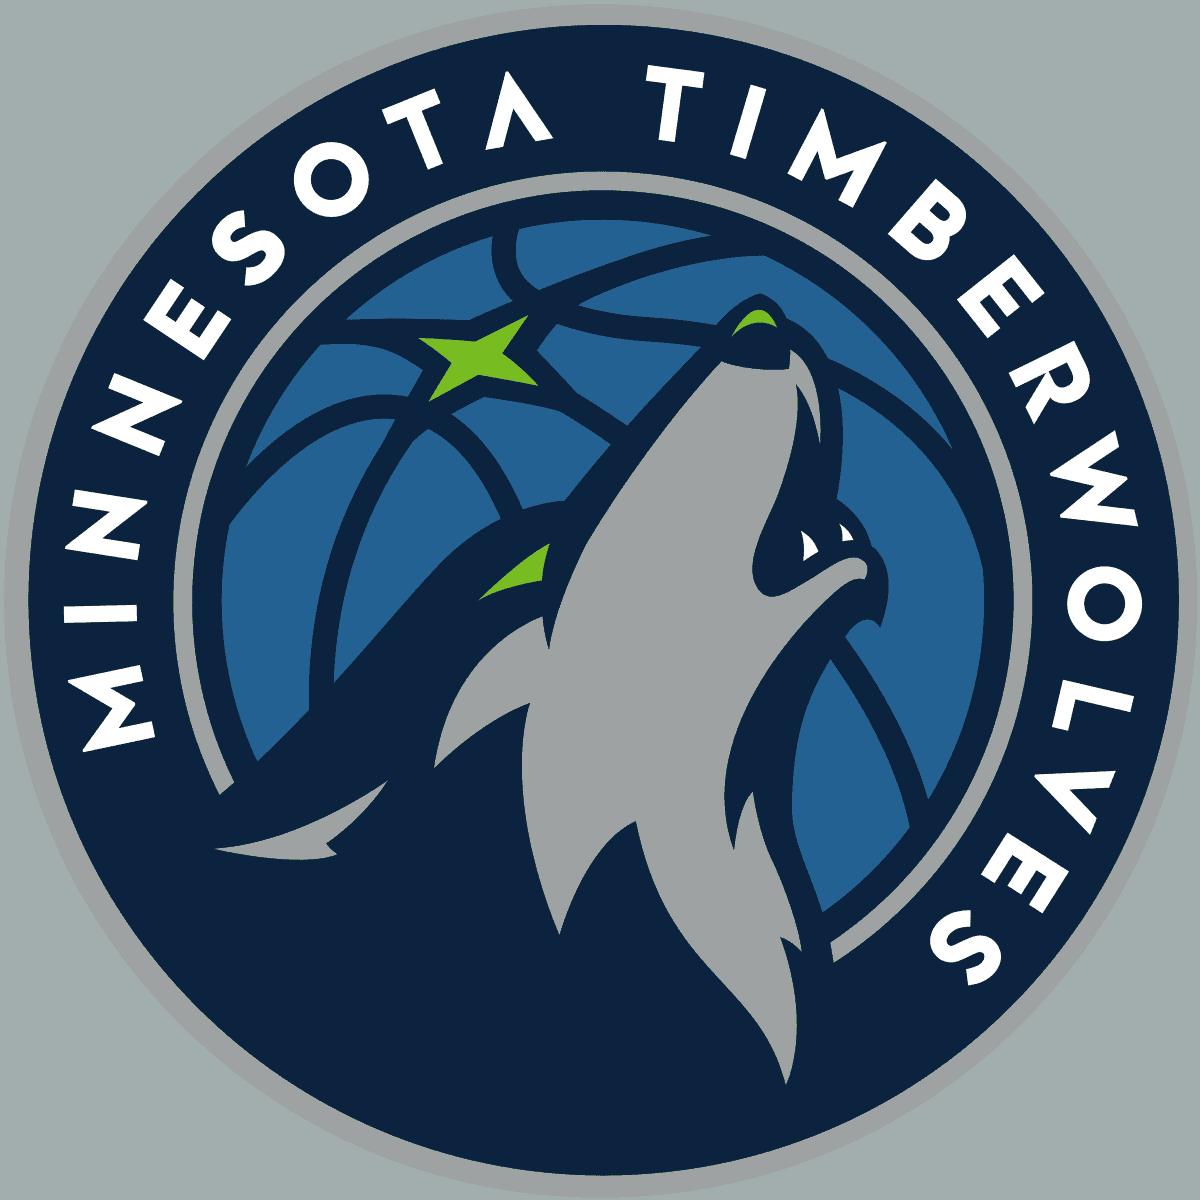 Minnesota Timberwolves case study